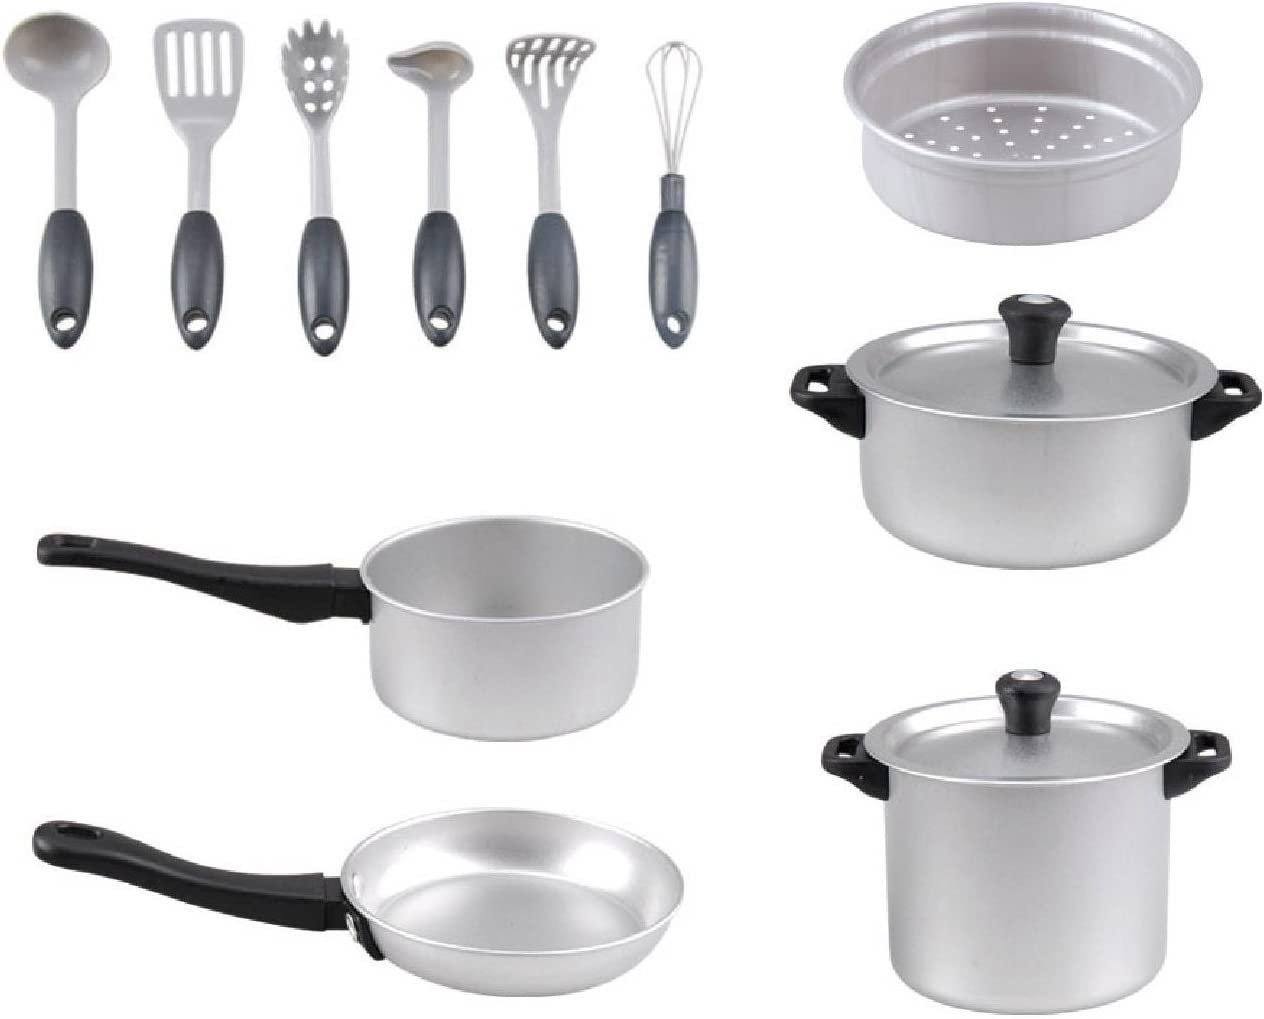 Kochtopf Set Metall Chef Collection 13 tlg mit Zubeh/ör Playgo 6940